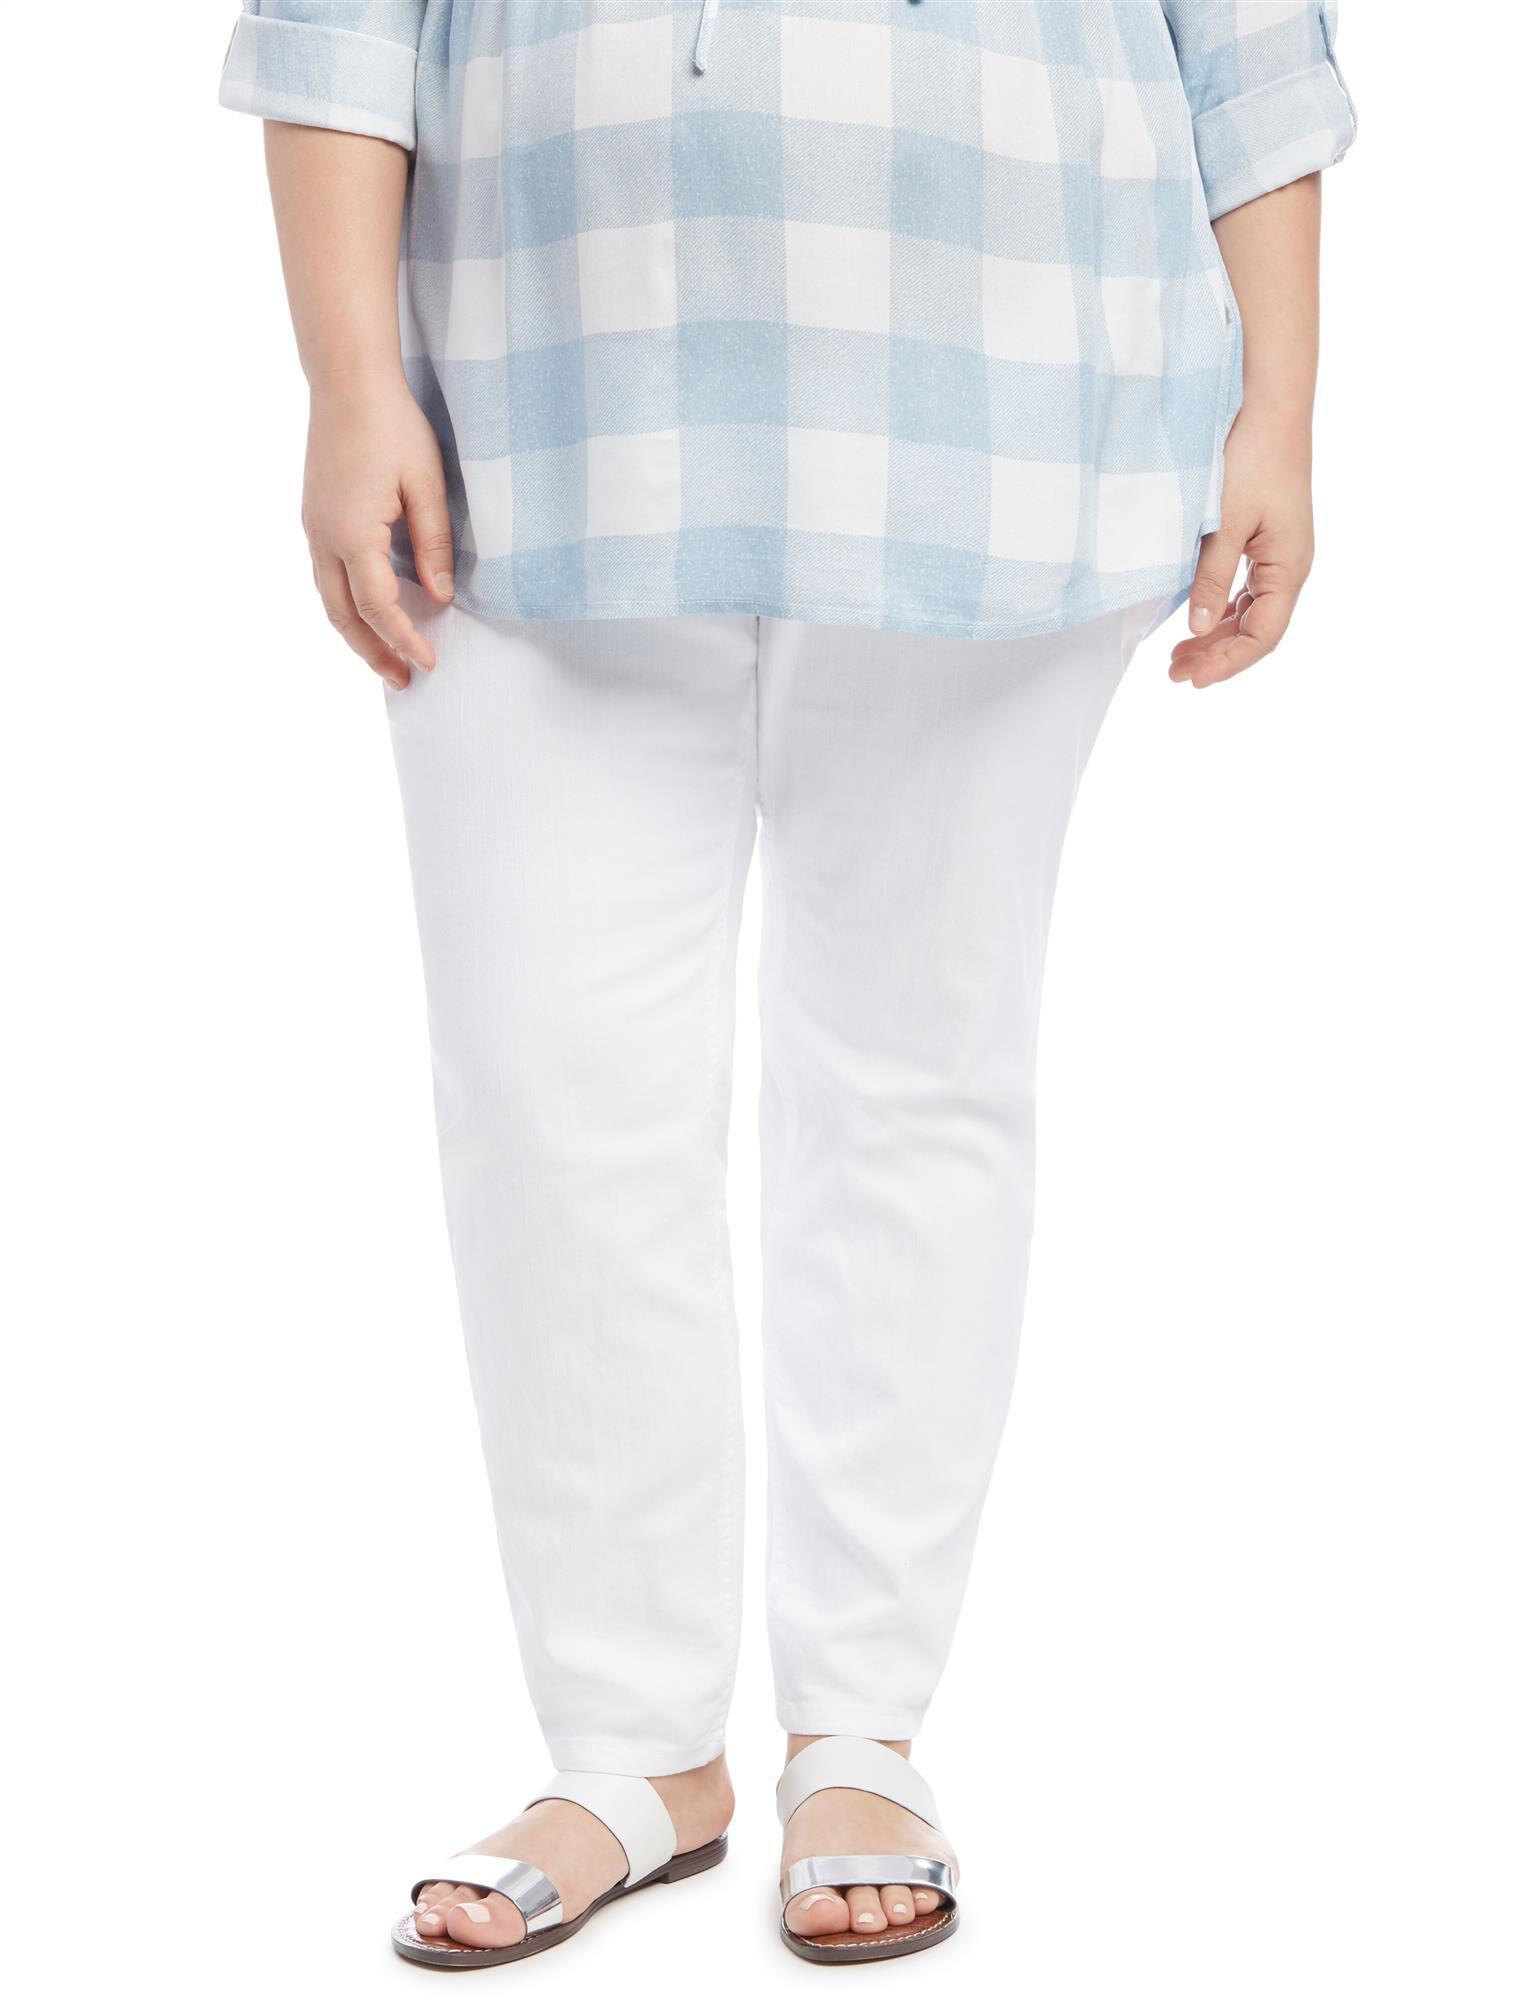 Plus Size Secret Fit Belly Skinny Leg Maternity Jeans